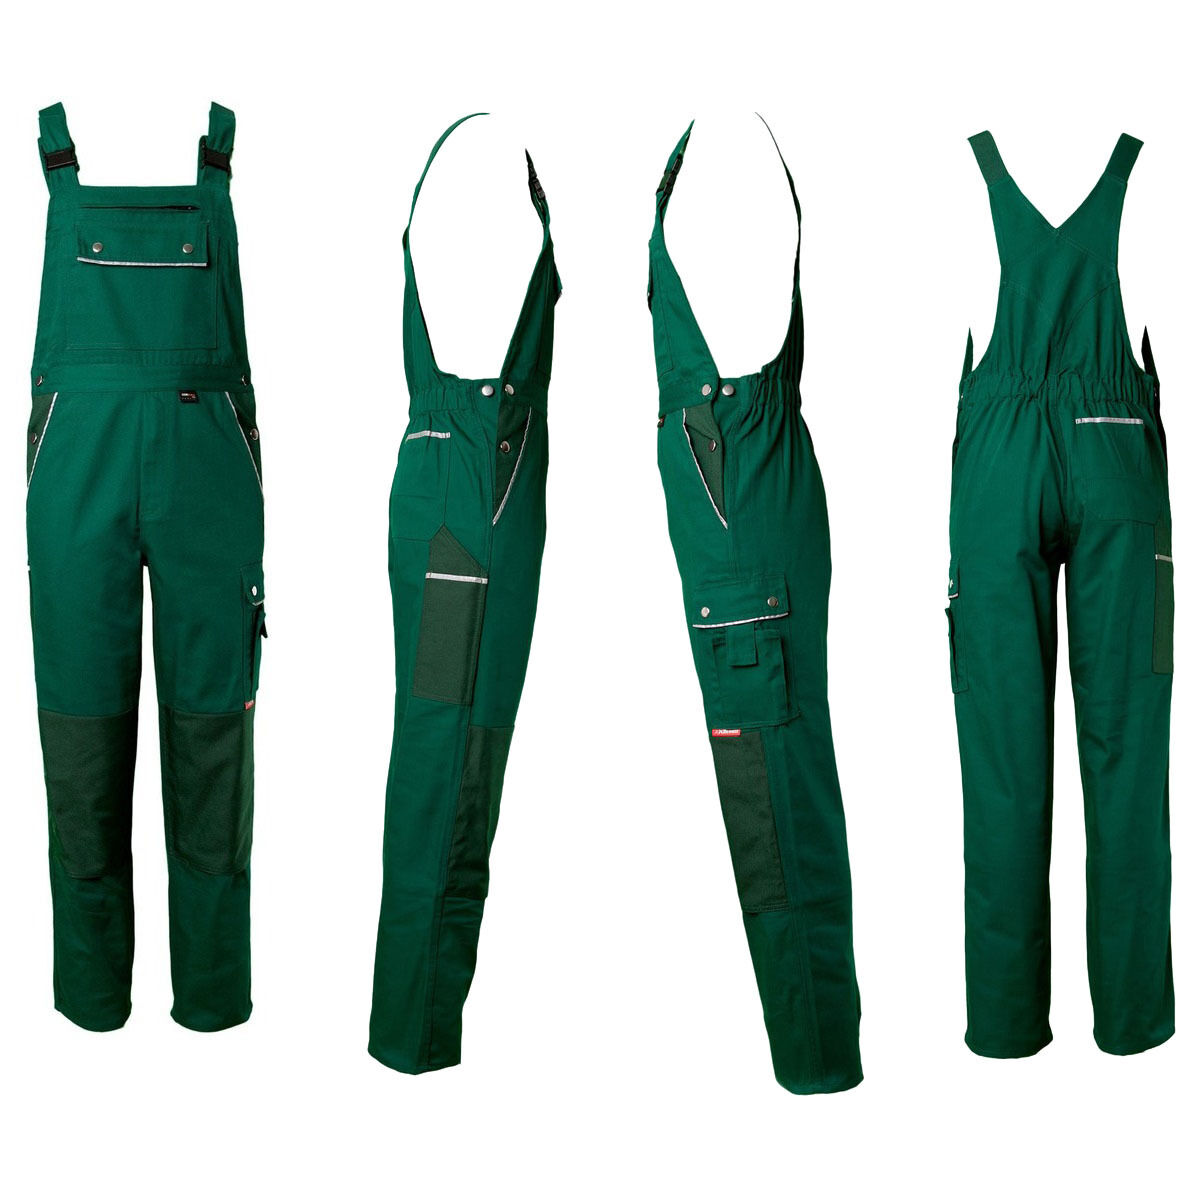 Tubo Flessibile Pantaloni Giardino Abbigliamento Giardiniere Pantaloni Flessibile da Salopette Lavoro ef7f25